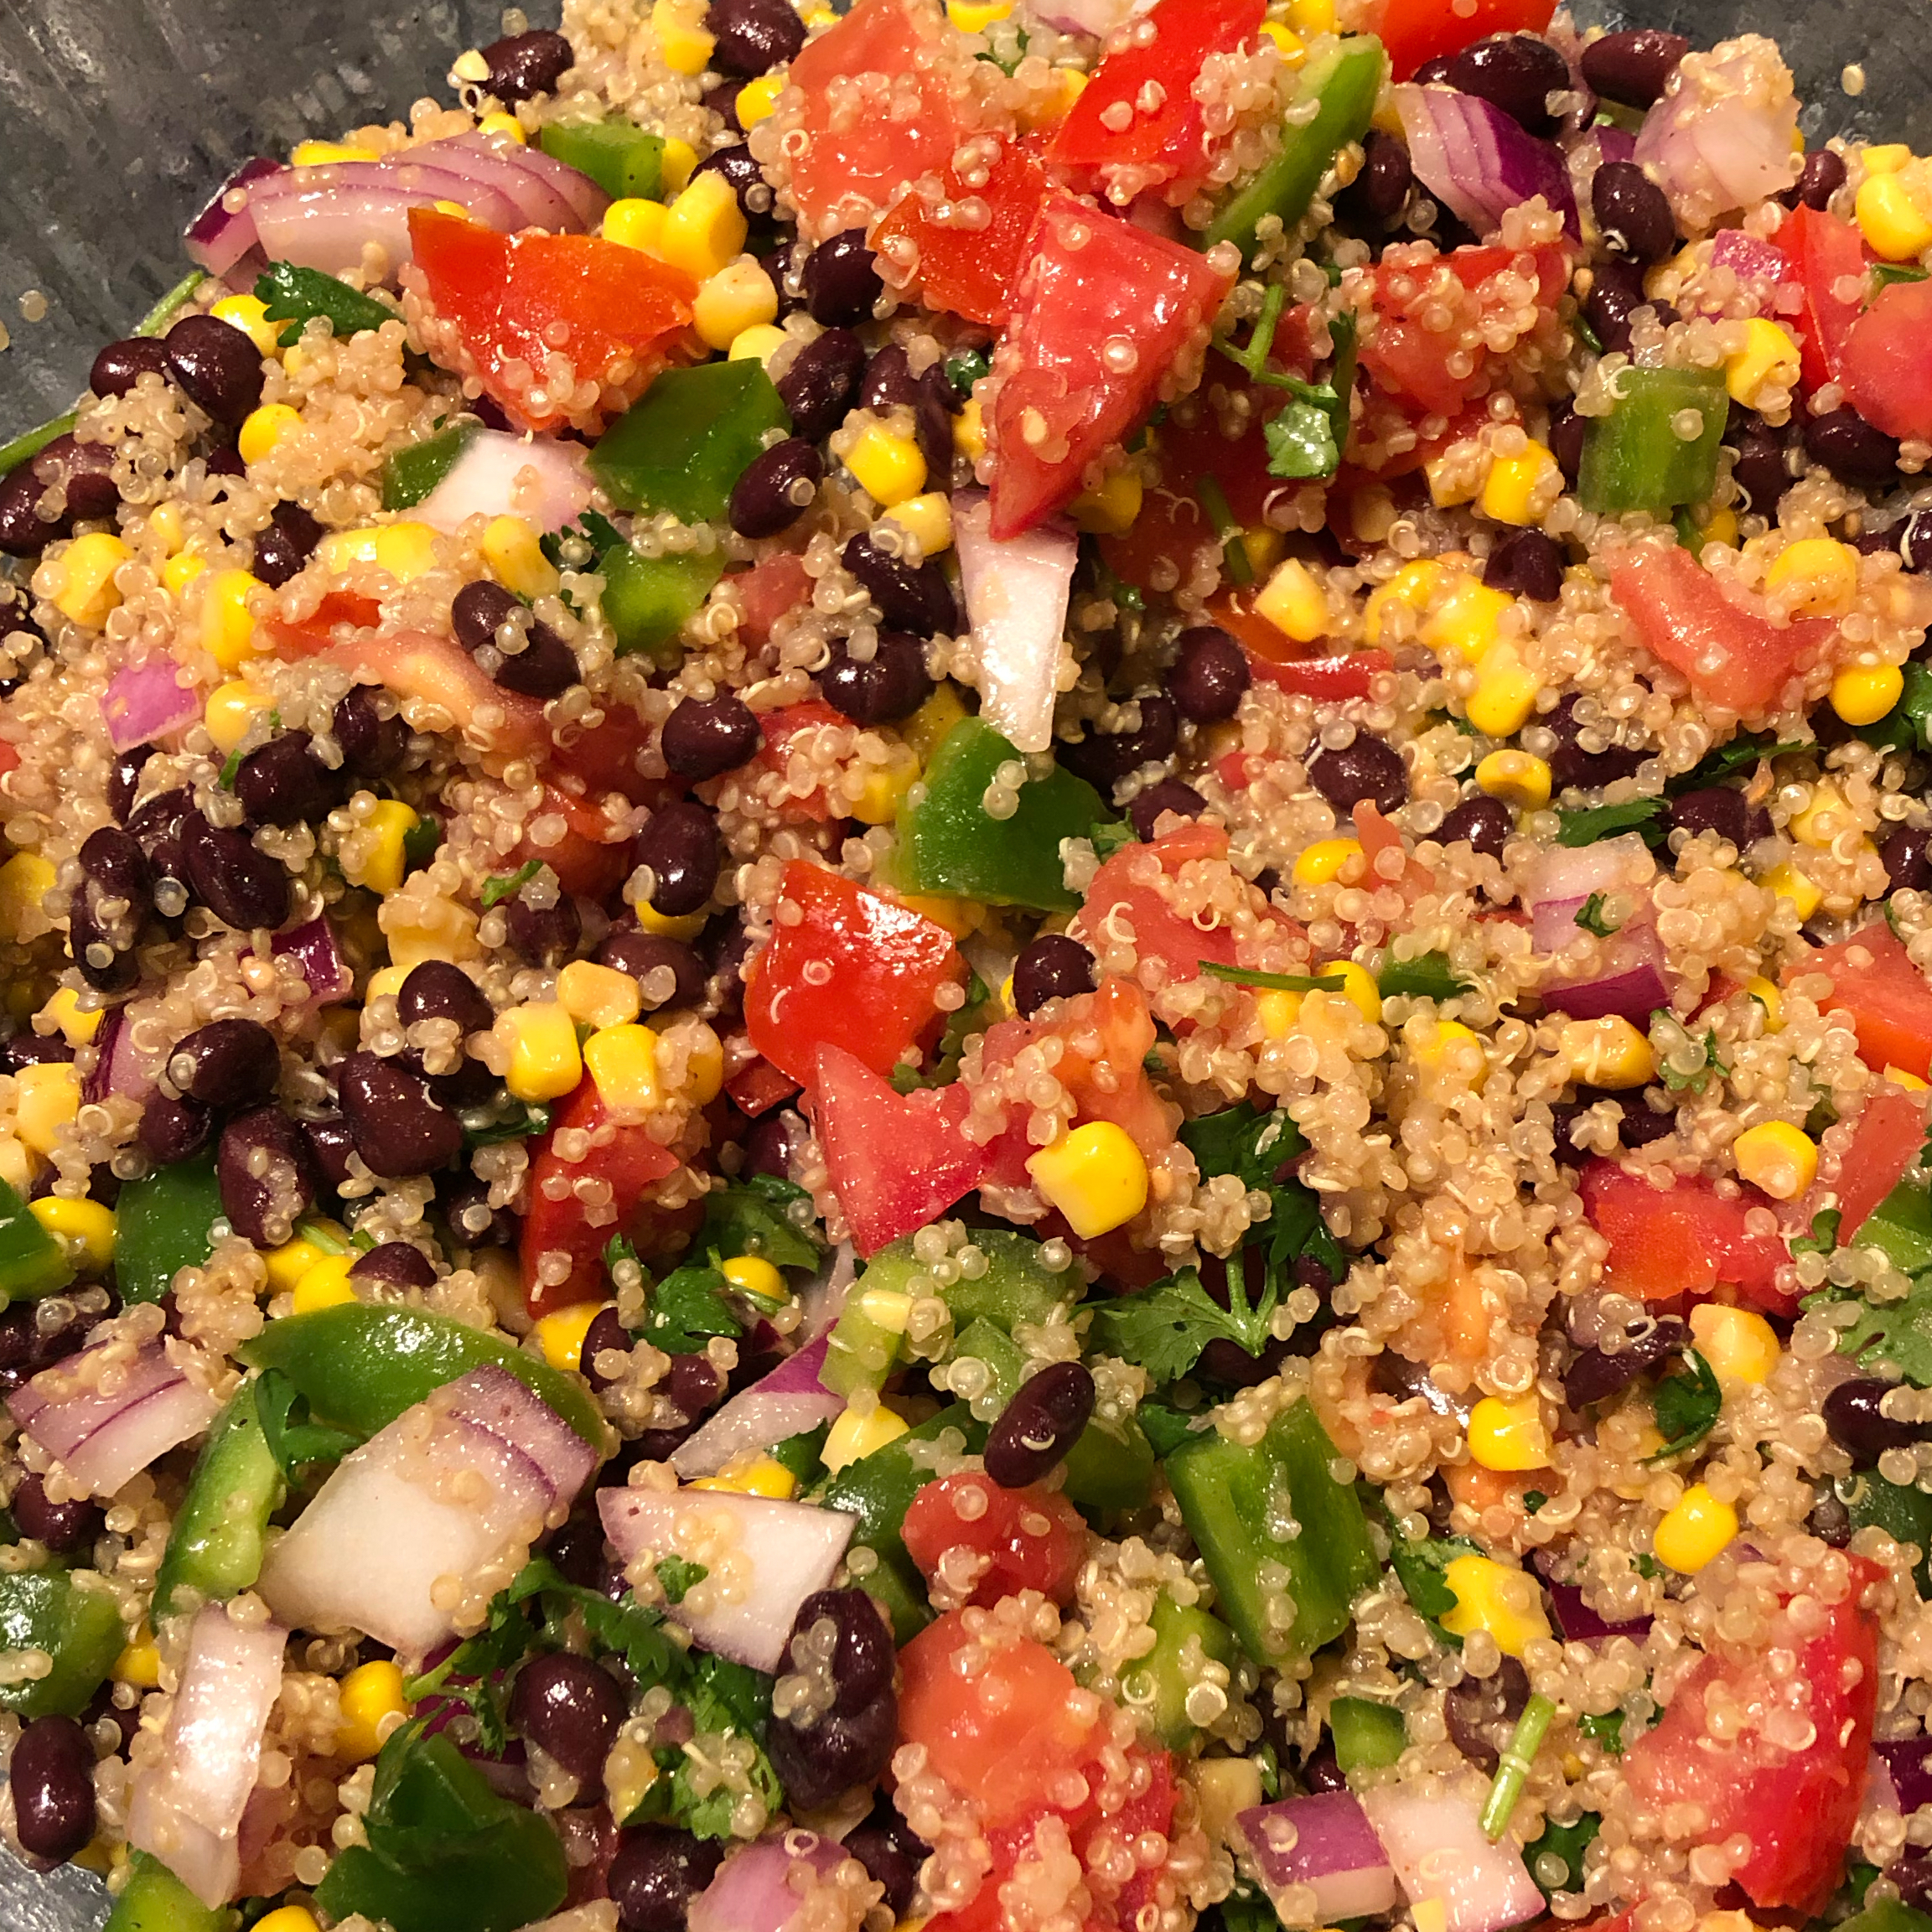 Southwestern Quinoa Salad michellema202@hotmail.com